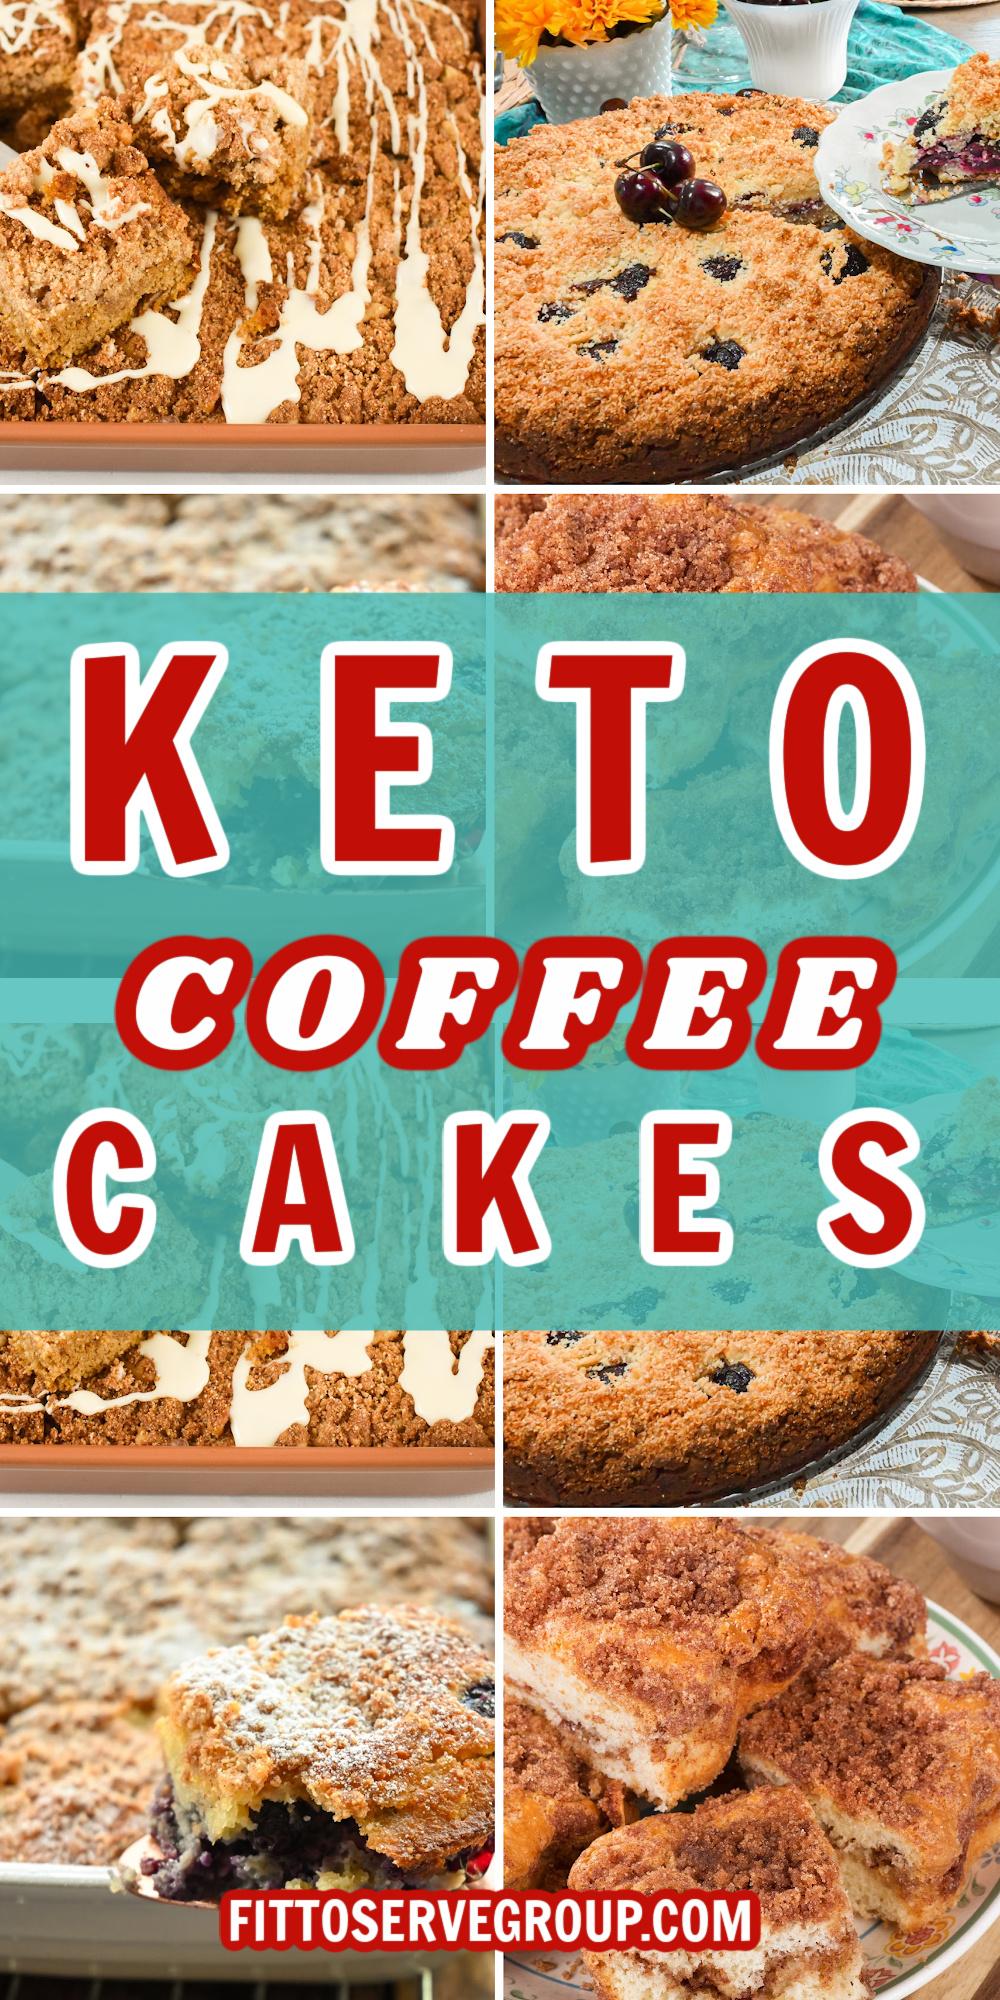 Keto Coffee Cakes